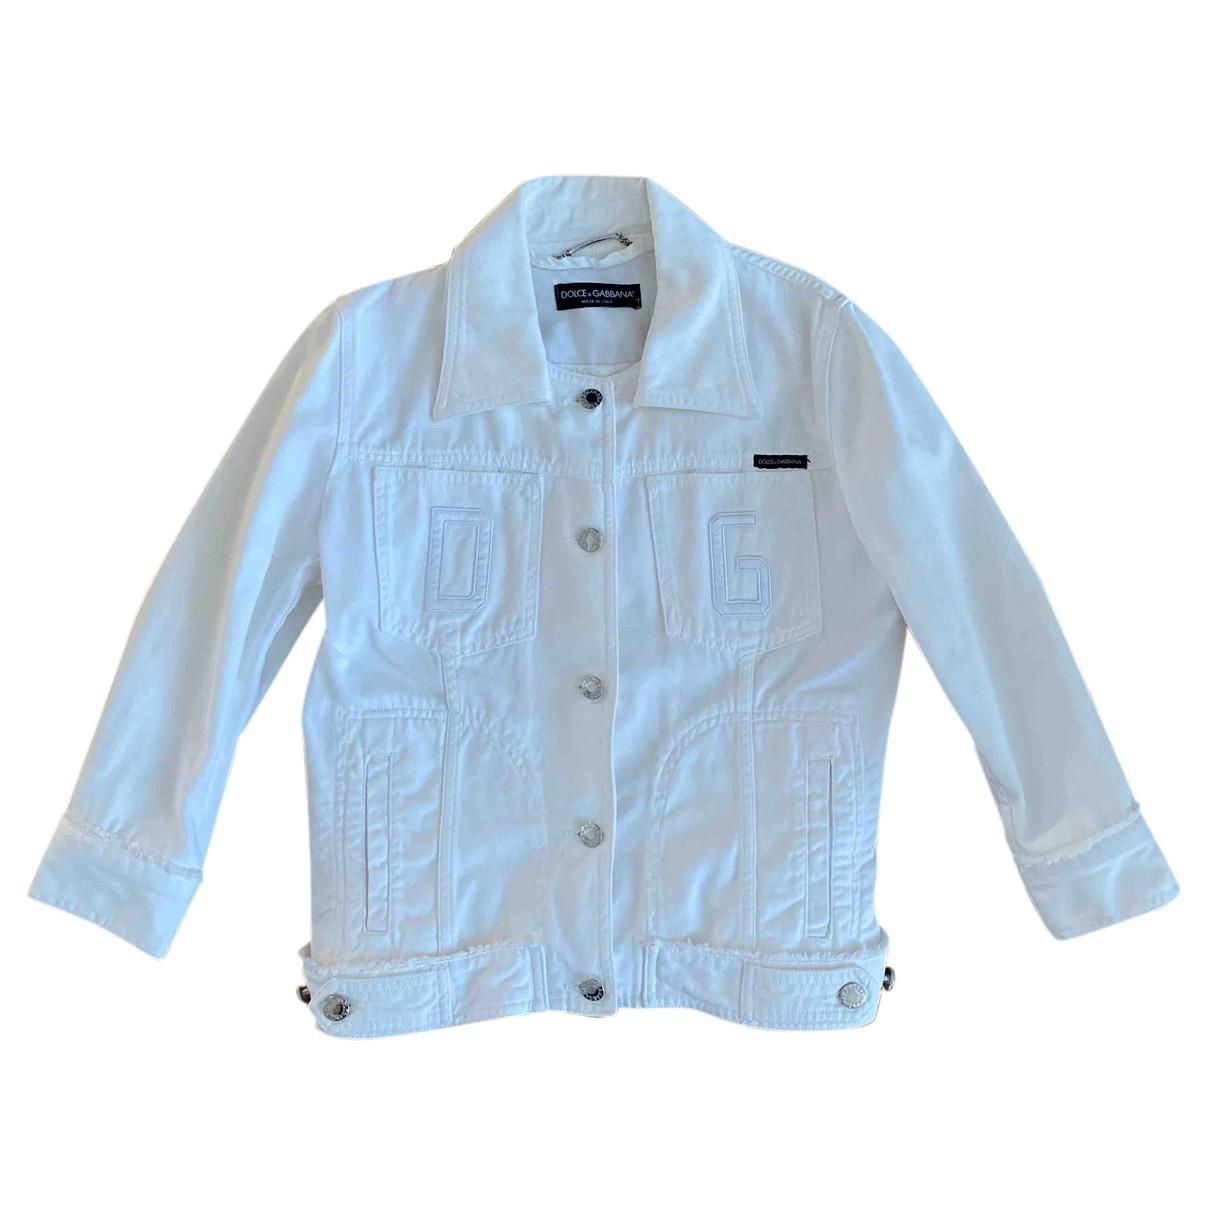 Dolce & Gabbana N White Denim - Jeans jacket for Women 42 IT